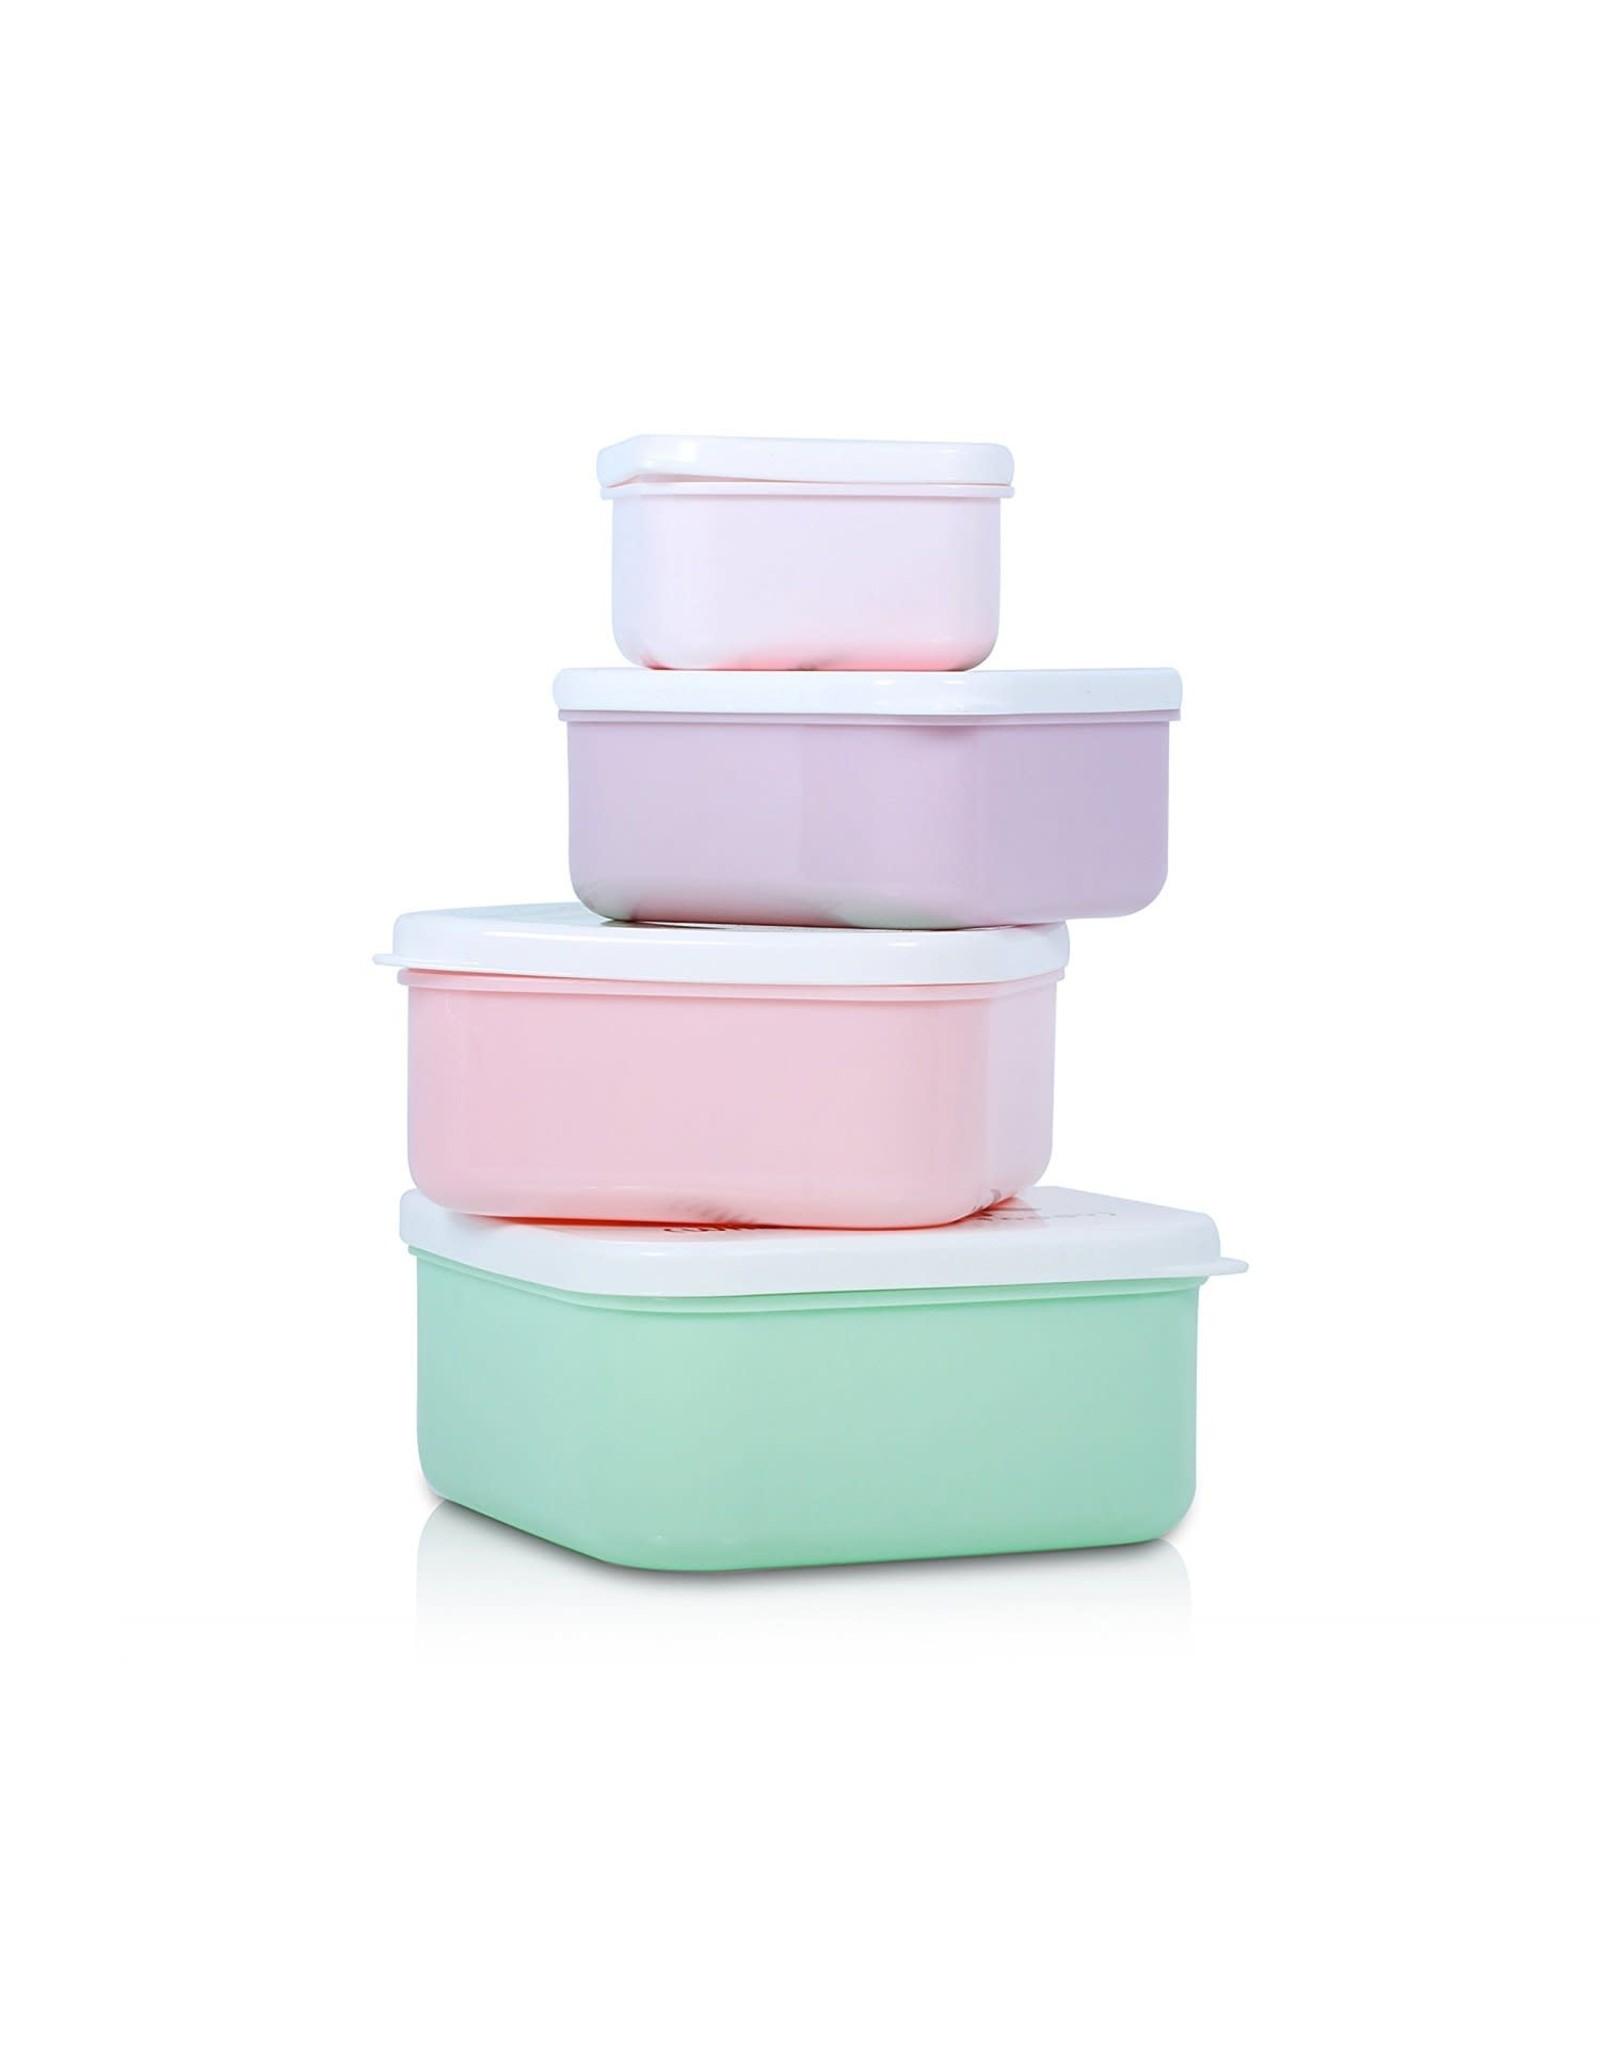 Pusheen Snack Box Set of 4